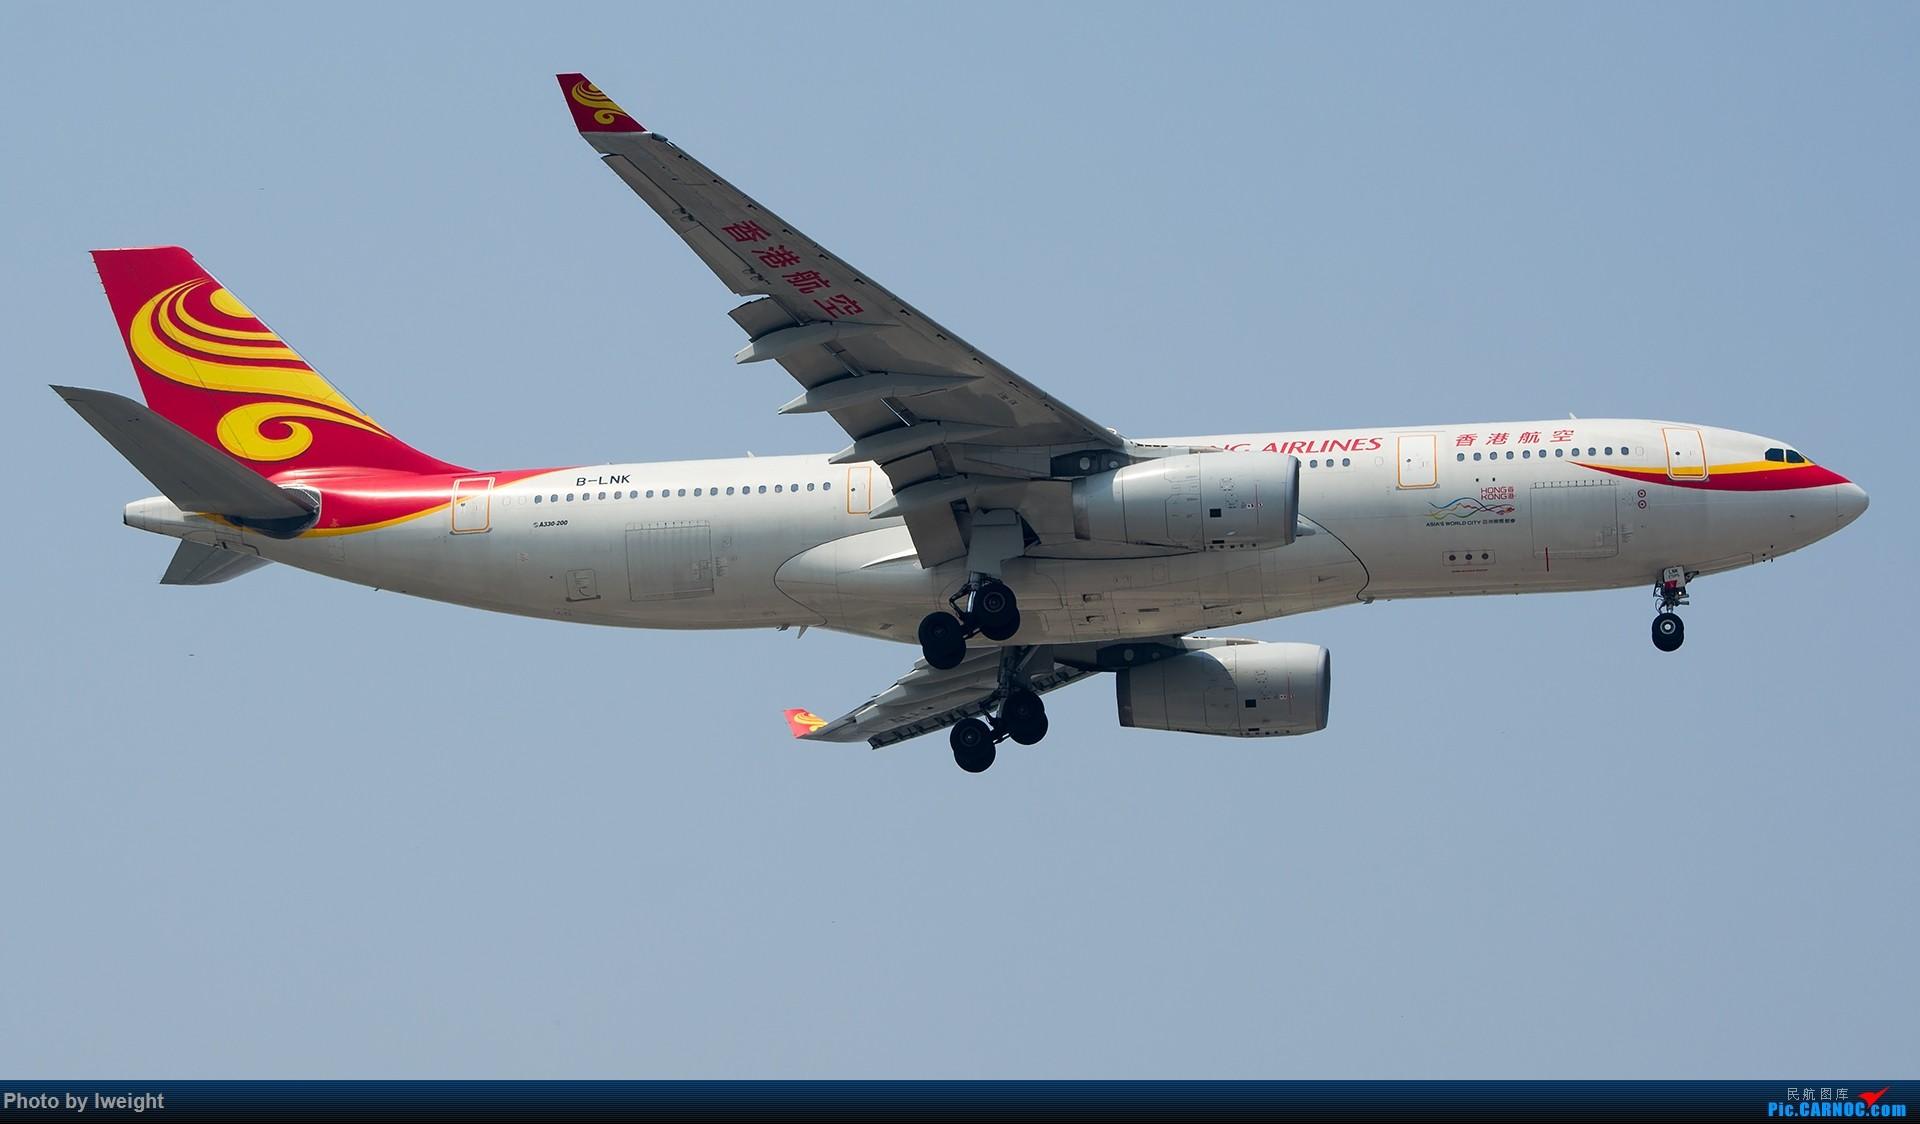 Re:[原创]周末帝都霾天拍机,凑合看看吧【2015-5-23】 AIRBUS A330-200 B-LNK 中国北京首都国际机场